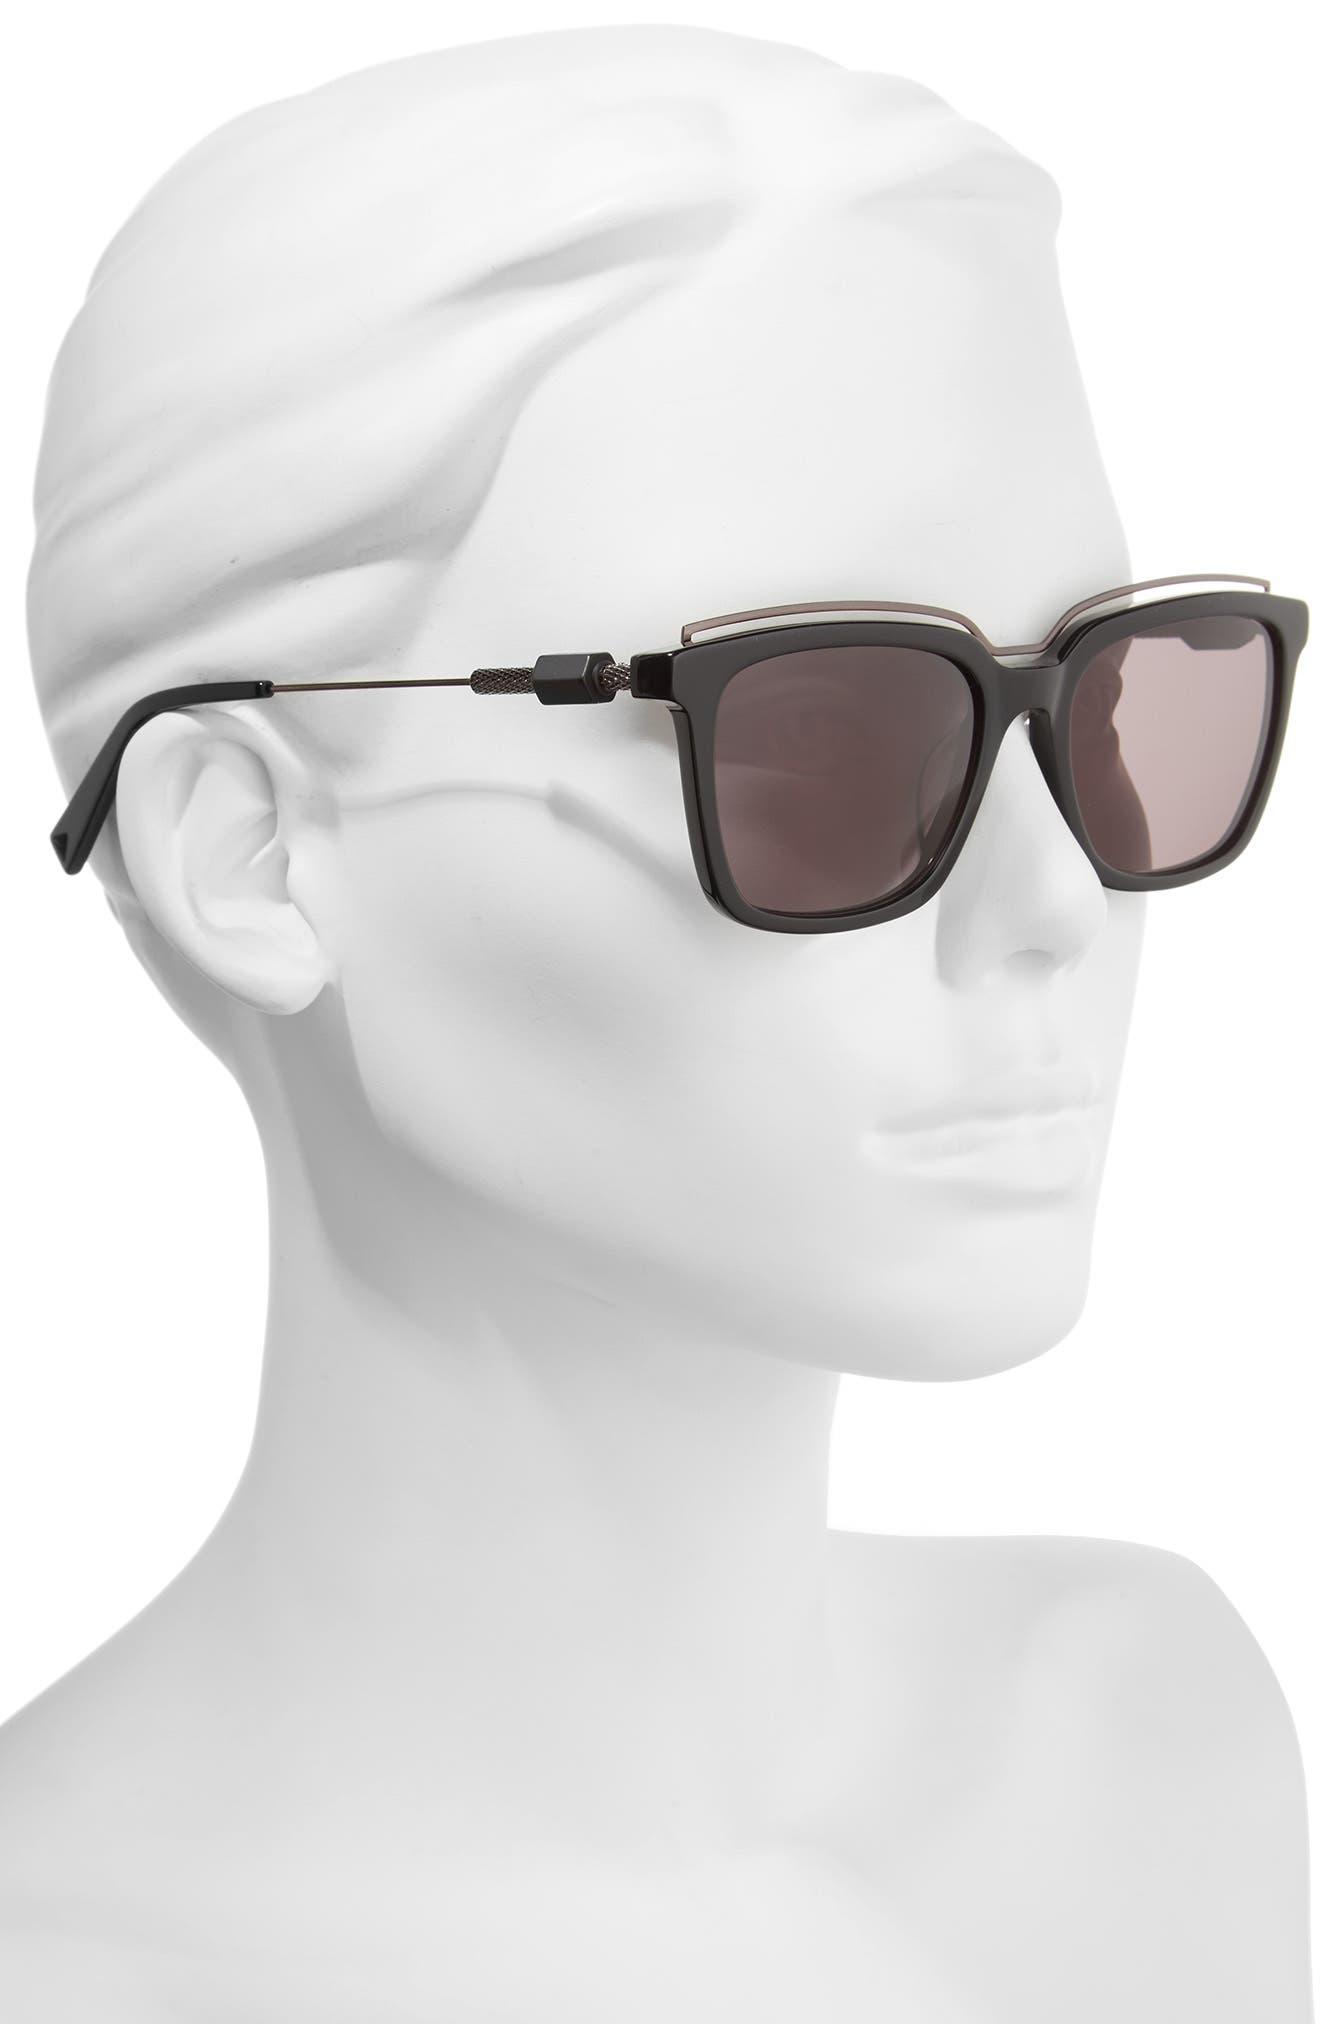 Opus 54mm Sunglasses,                             Alternate thumbnail 4, color,